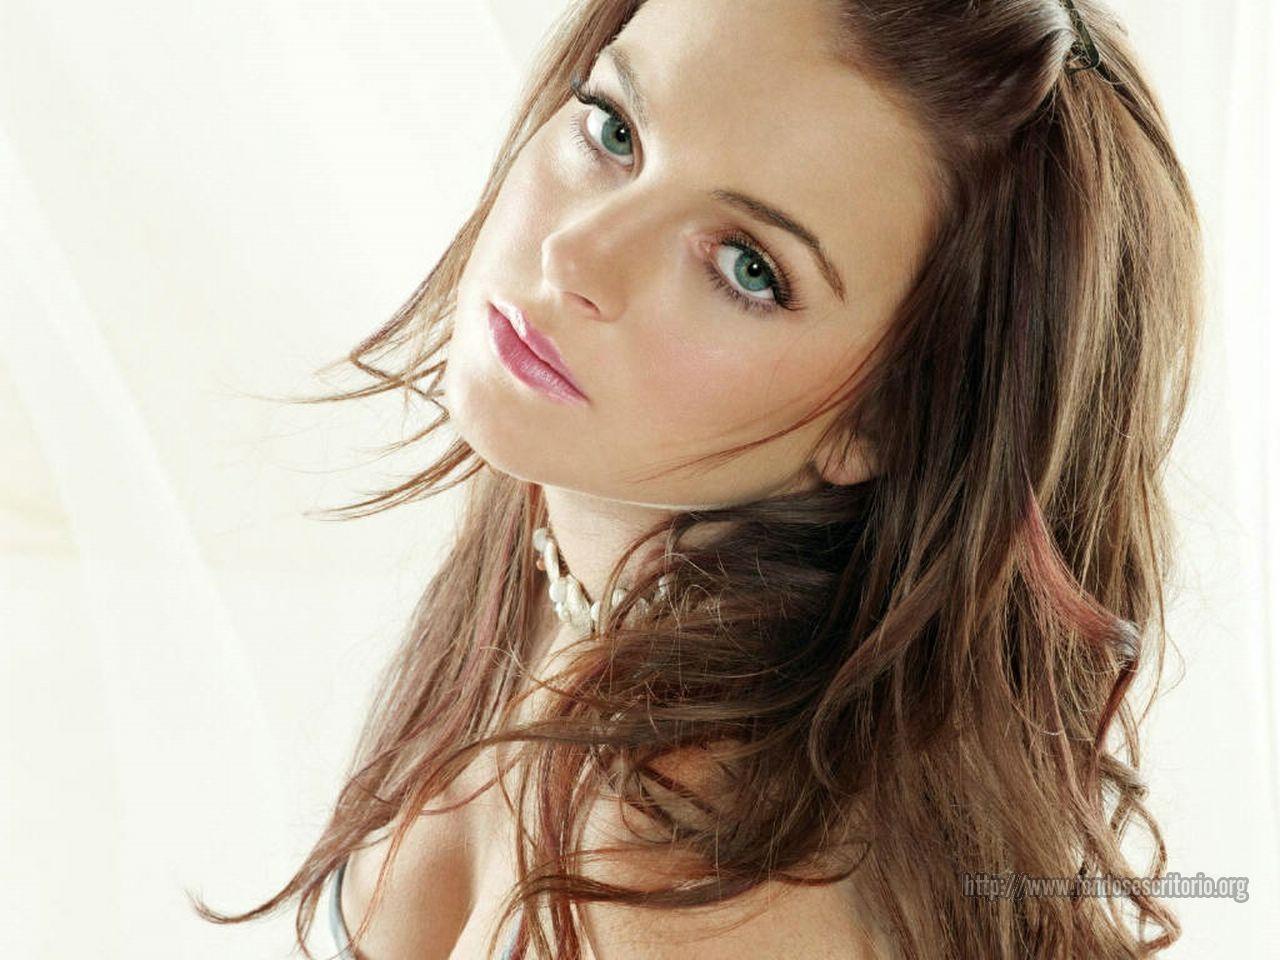 http://3.bp.blogspot.com/_gPfXA7JgTxg/TMWRzkIJTDI/AAAAAAAAaM0/je08ogs2rl4/s1600/Lindsay+Lohan+176+%5B1280x768%5D-286507.jpeg